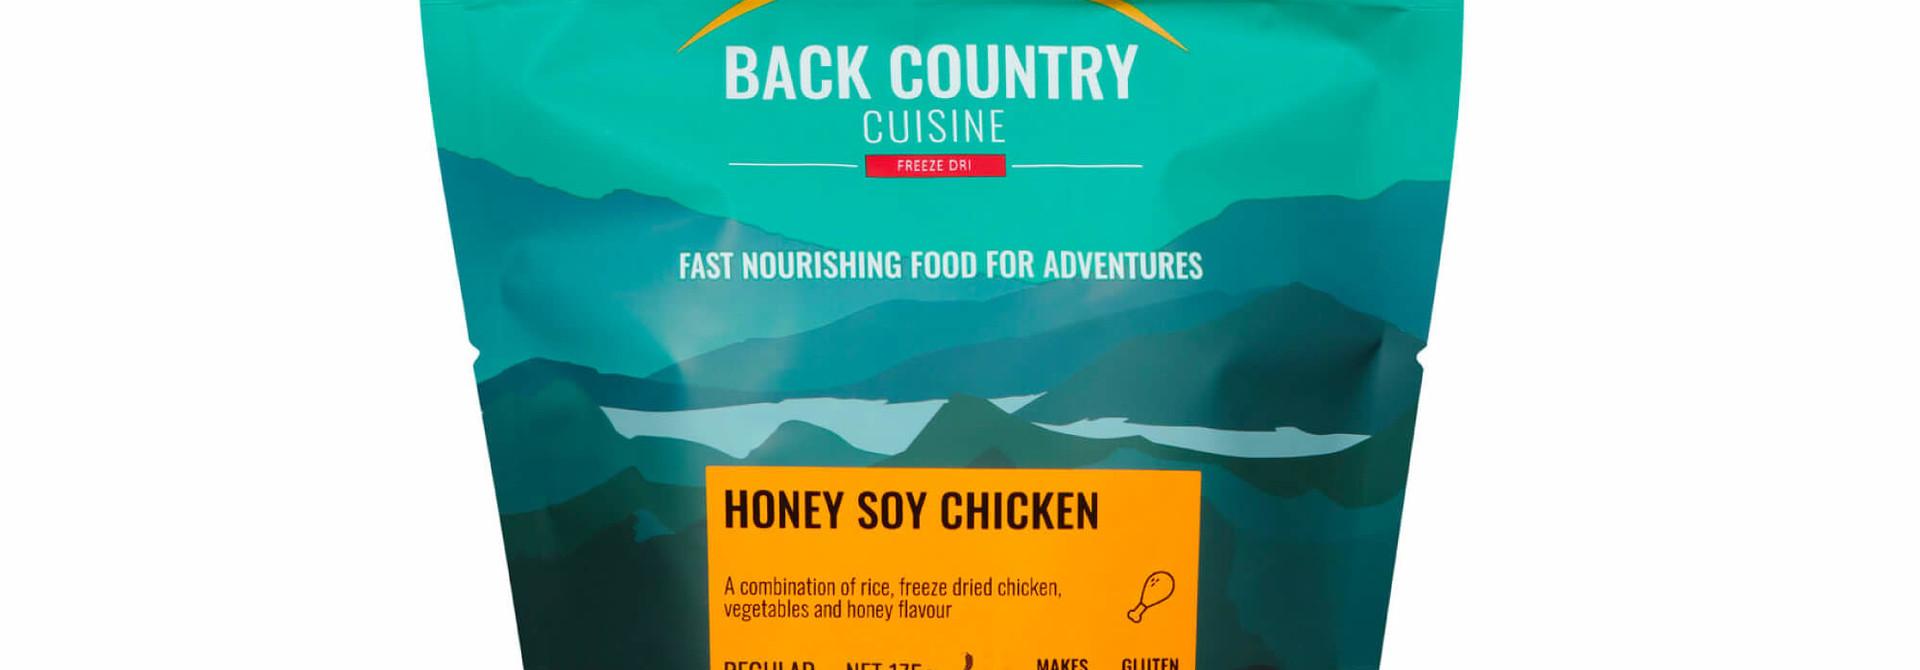 Back Country Cuisine Honey Soy Chicken Regular